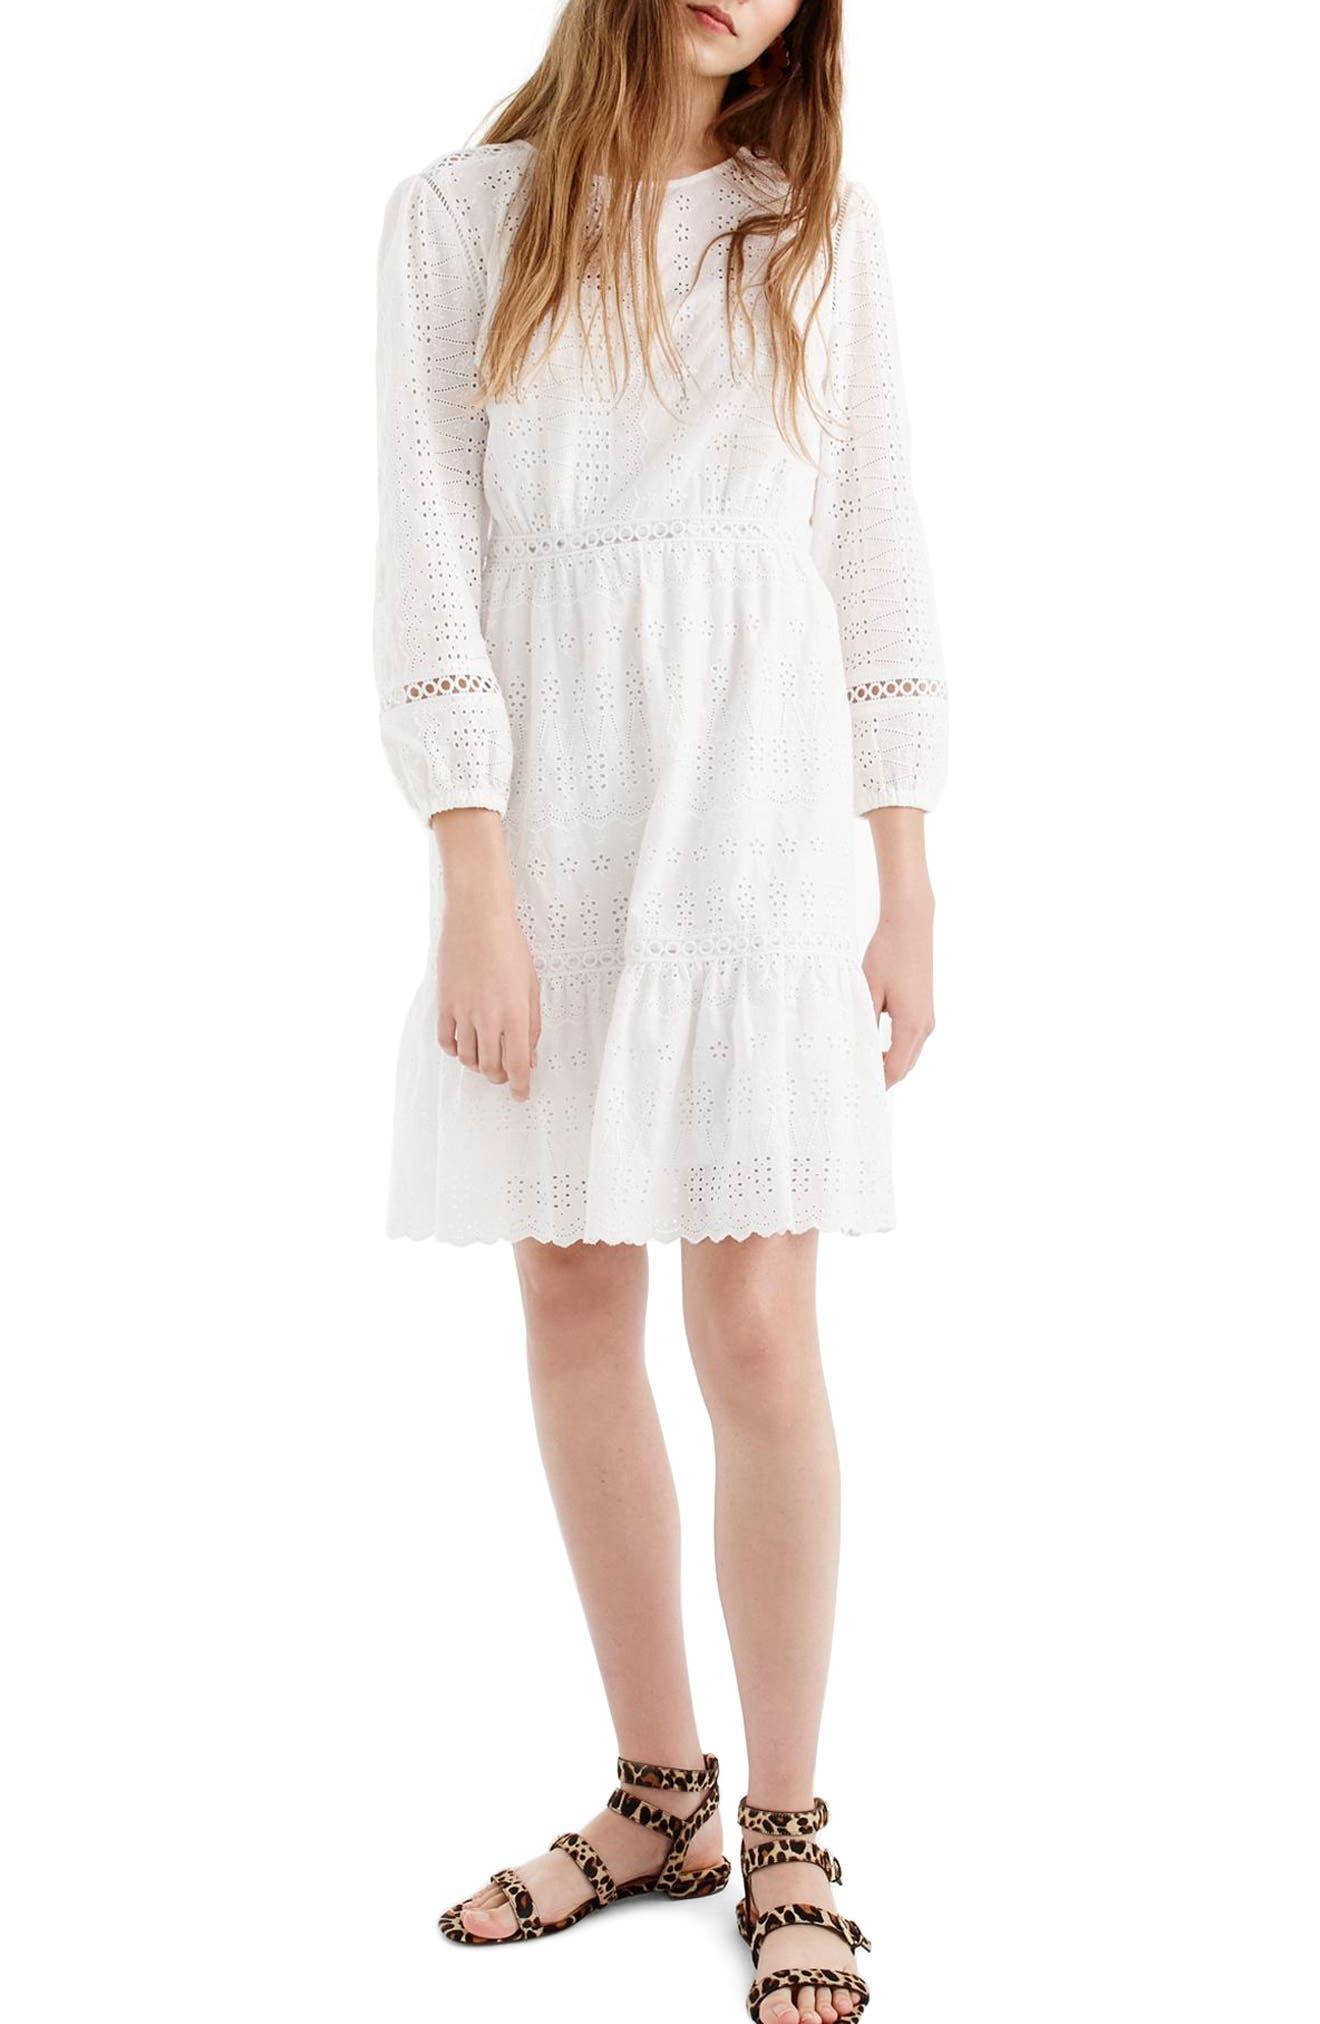 Main Image - J.Crew Long Sleeve Embroidered Dress (Regular & Petite)